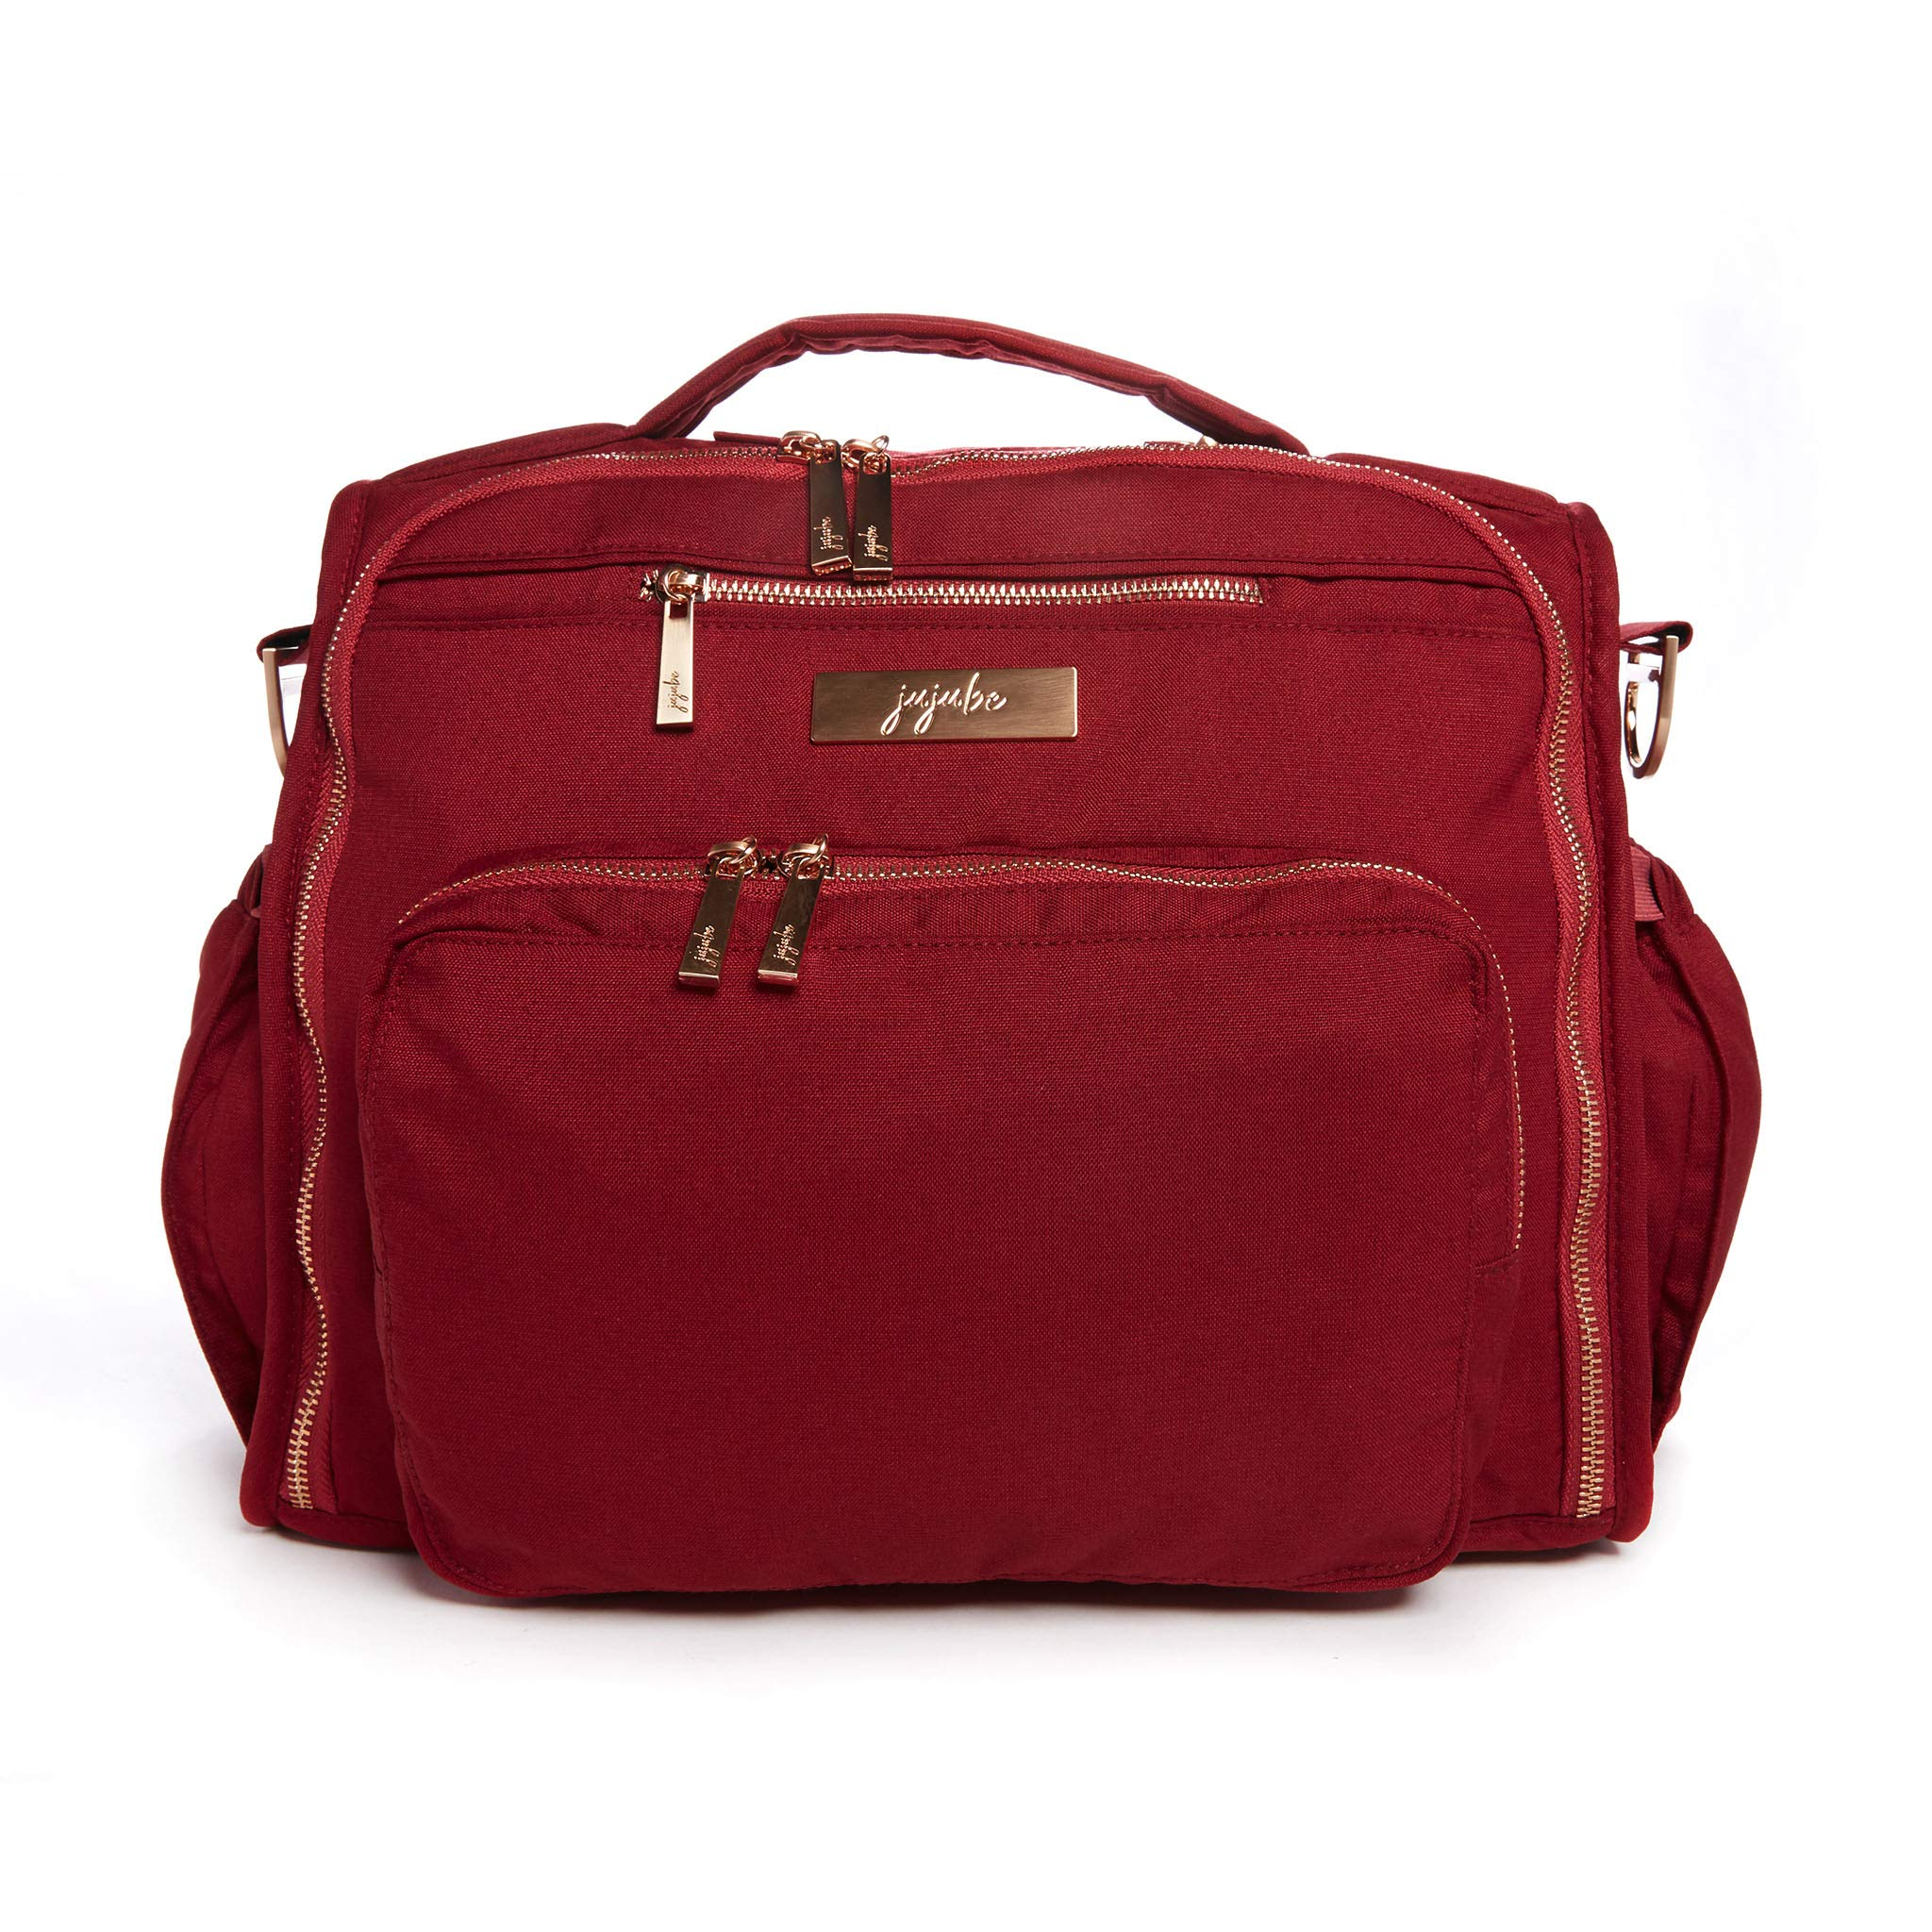 JuJuBe BFF Diaper Backpack   Tibetan Red   Chromatics   Multi-Functional Convertible + Messenger Bag   Travel-Friendly, Stylish Diaper Baby Bag with Laptop Pocket & Memory Foam Shoulder Strap